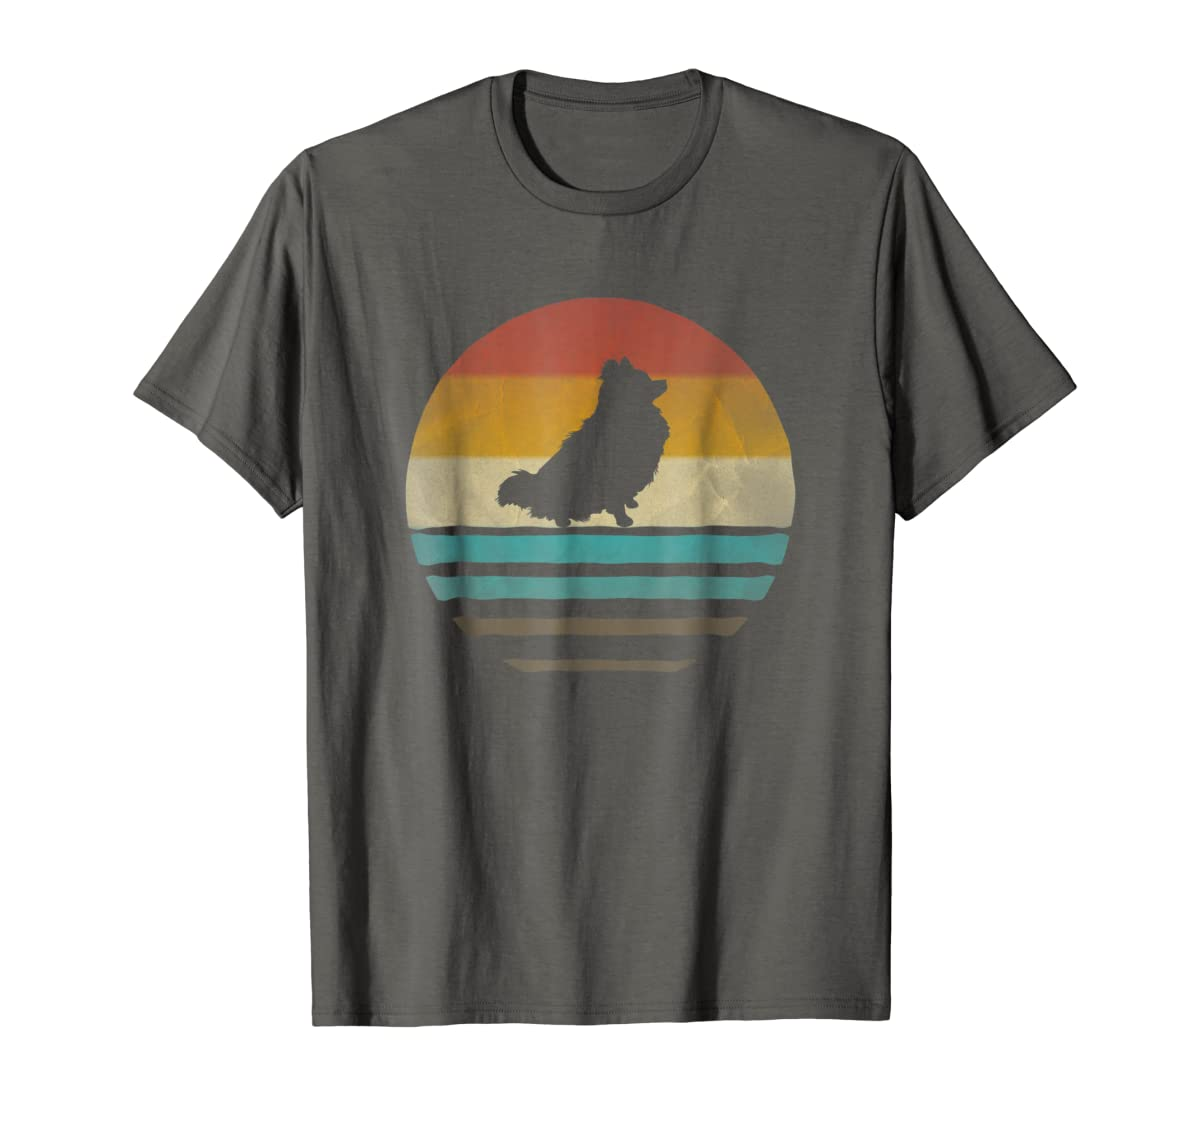 Pomeranian Dog Shirt Retro Vintage 70s Silhouette Distressed-Men's T-Shirt-Dark Heather